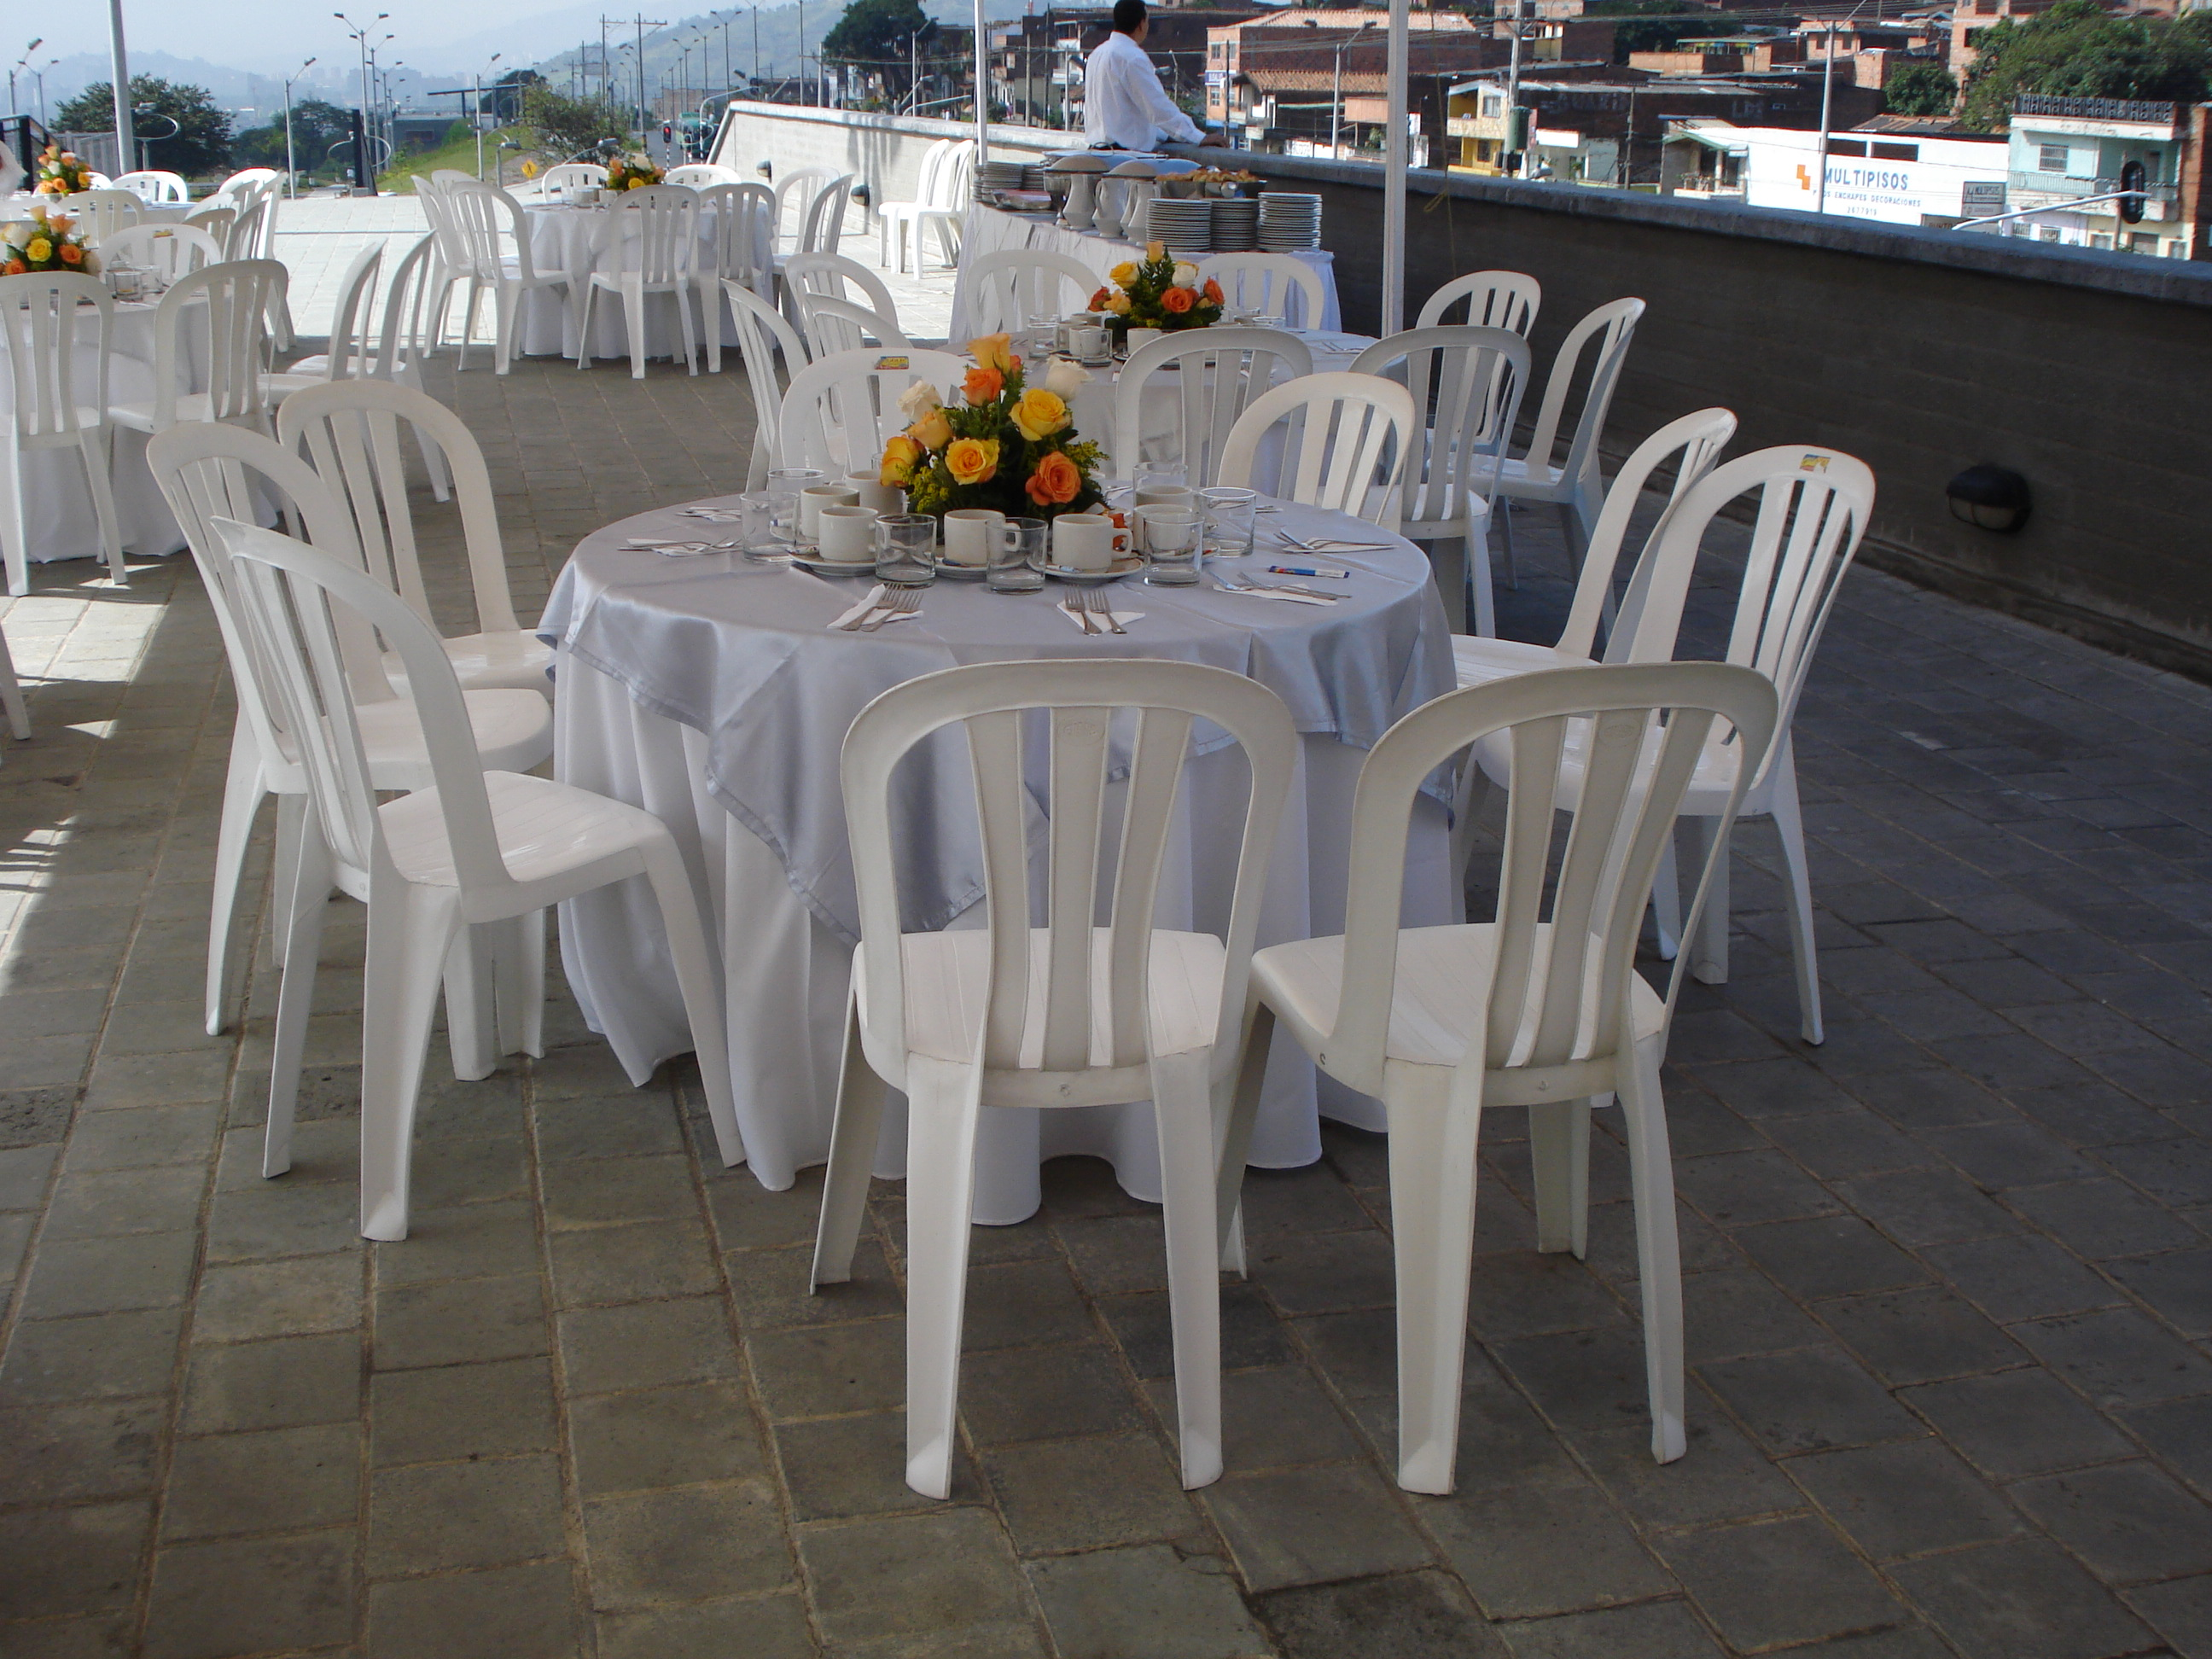 evento con alquiler de sillas